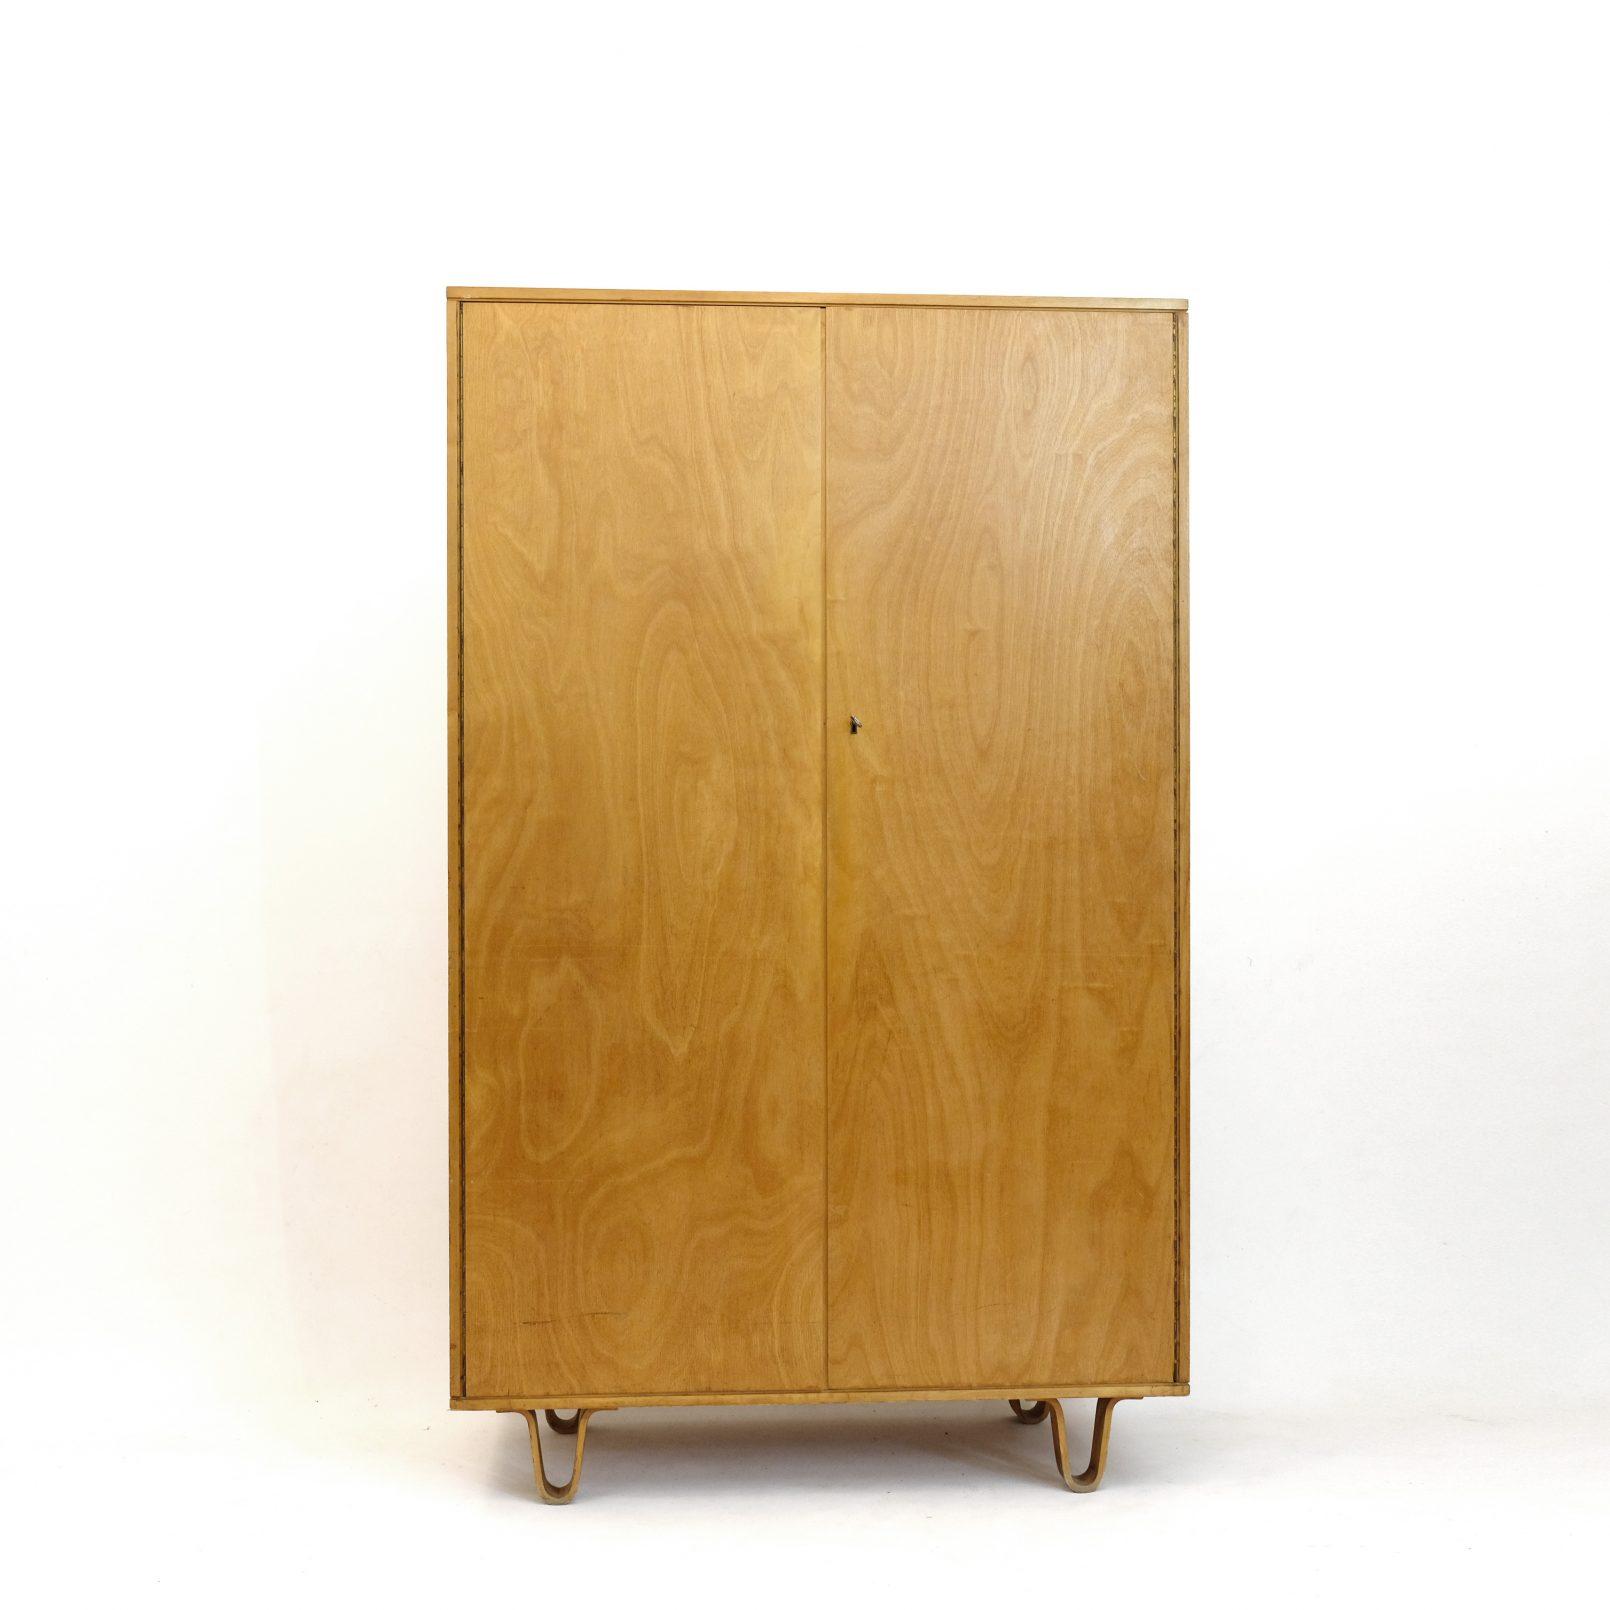 Cees Braakman, armoire KB02, Pastoe, 1950.